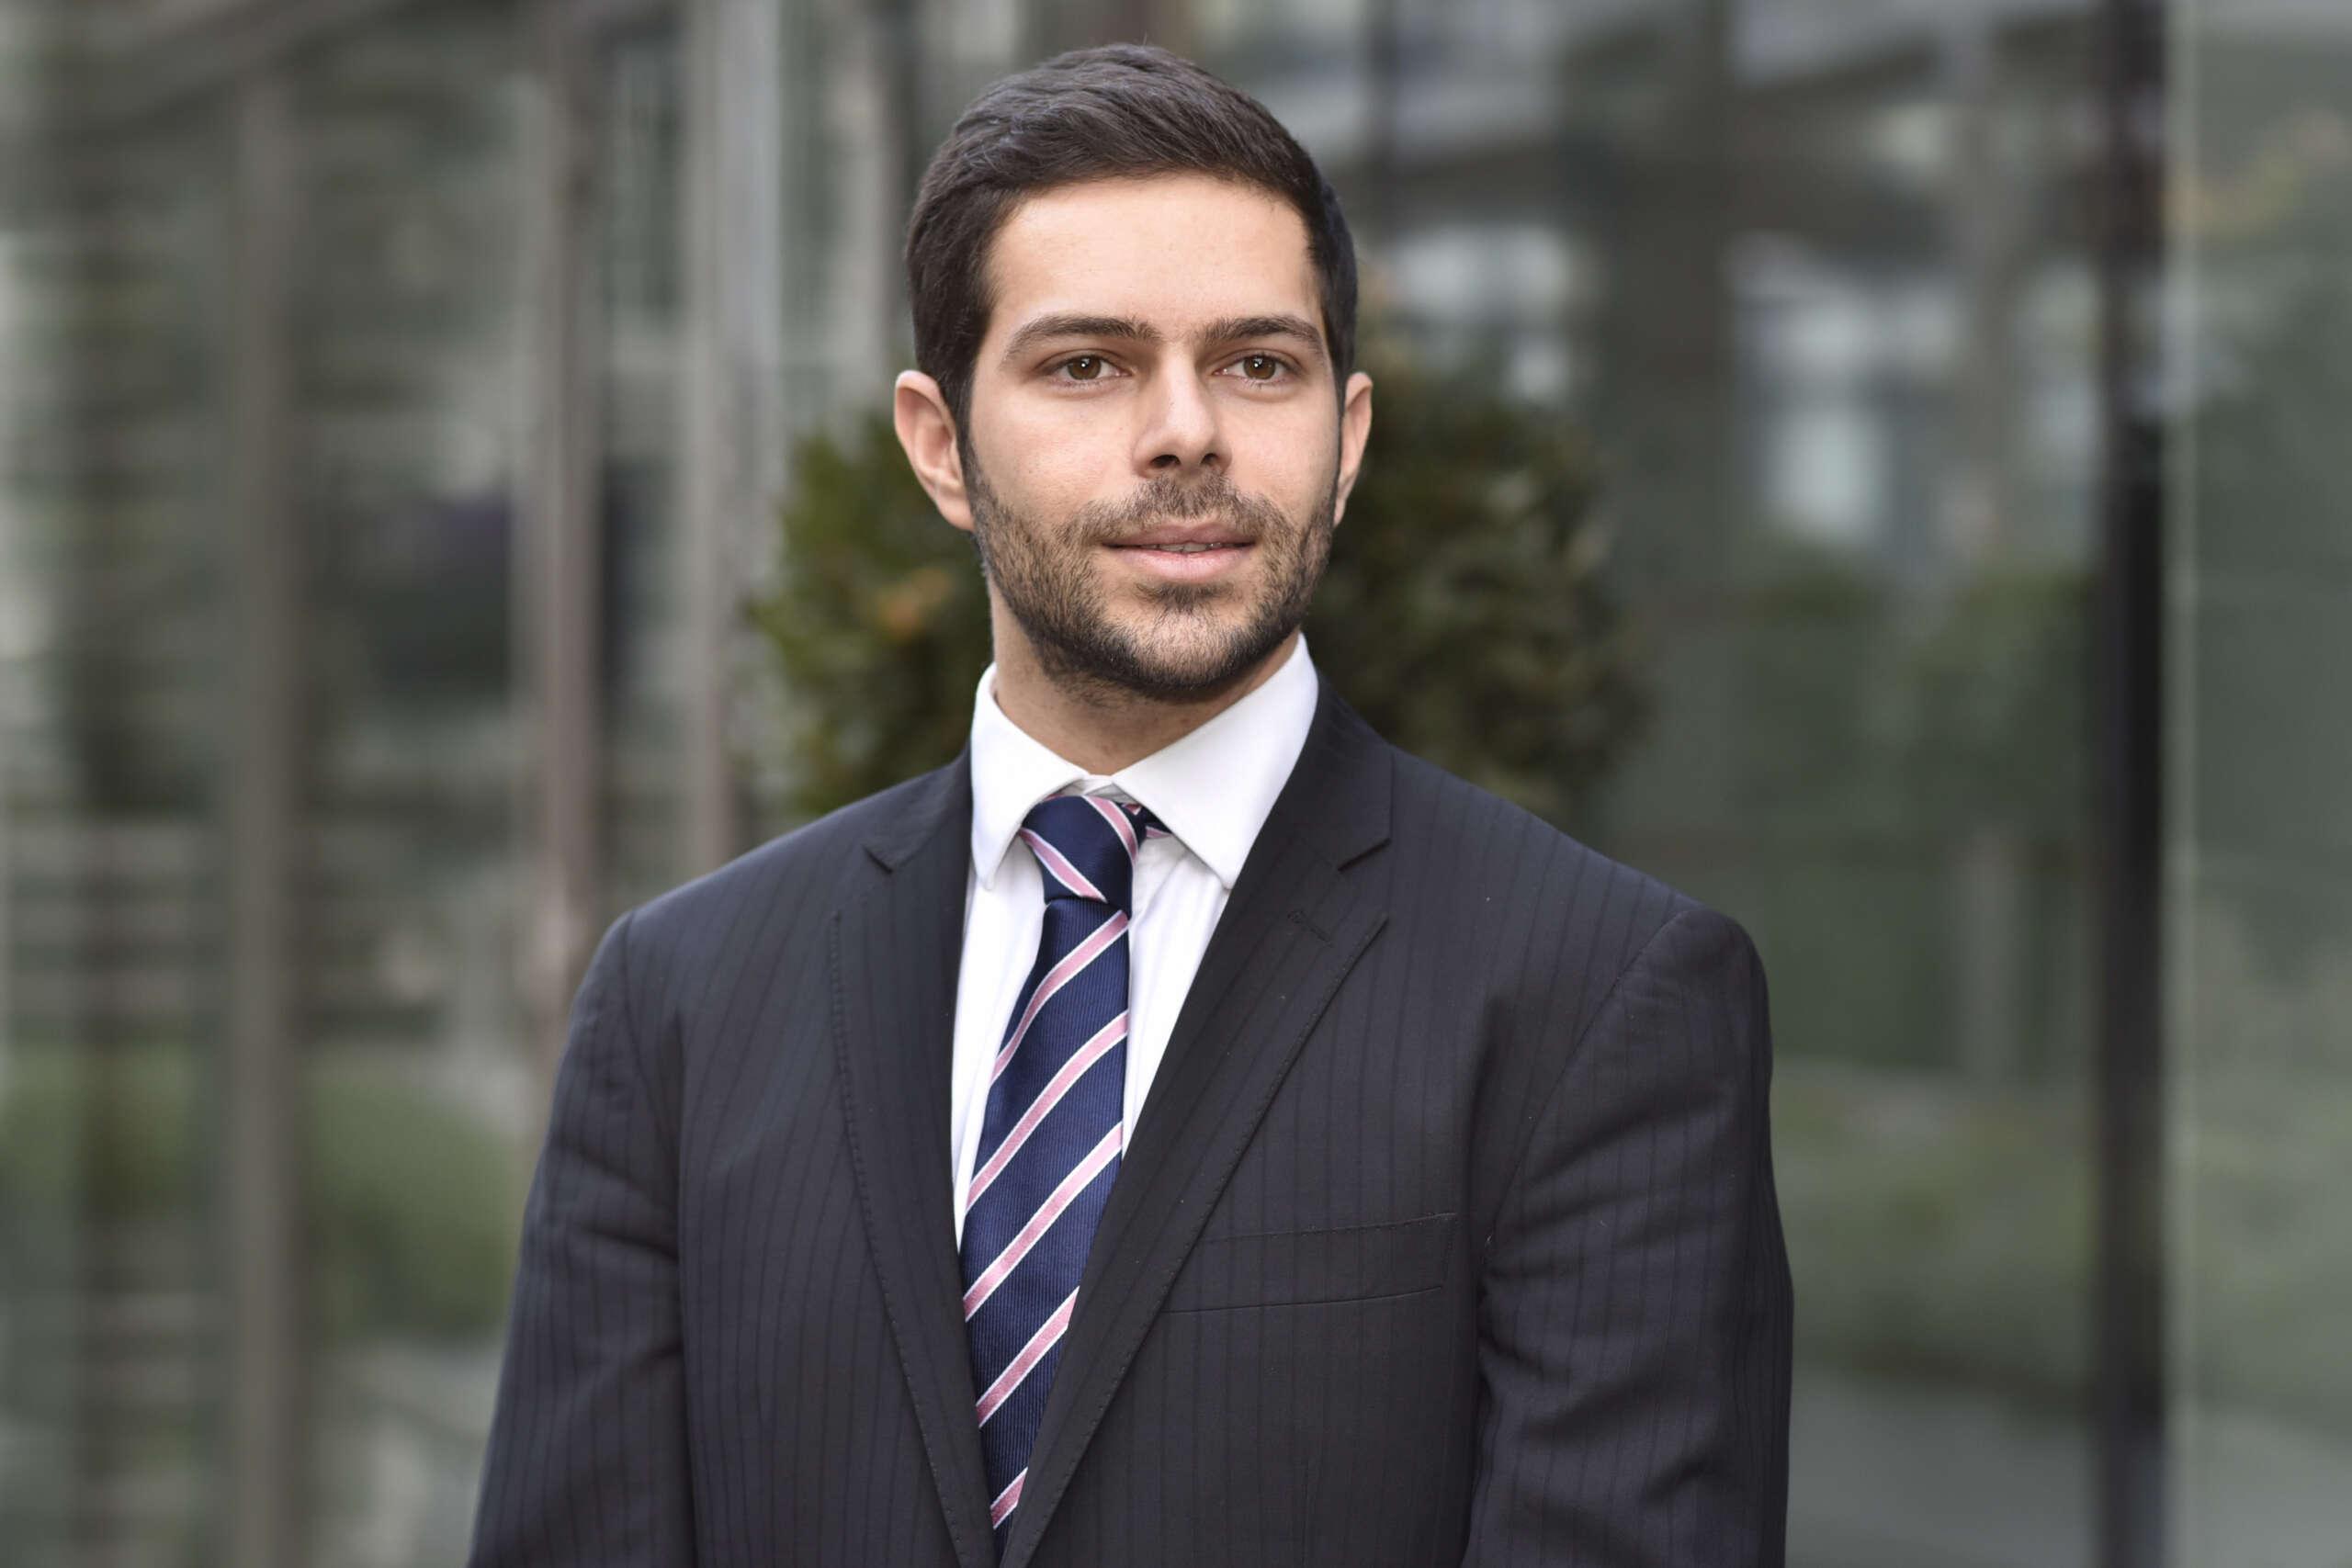 Evidentrust Financial Services Ltd - director